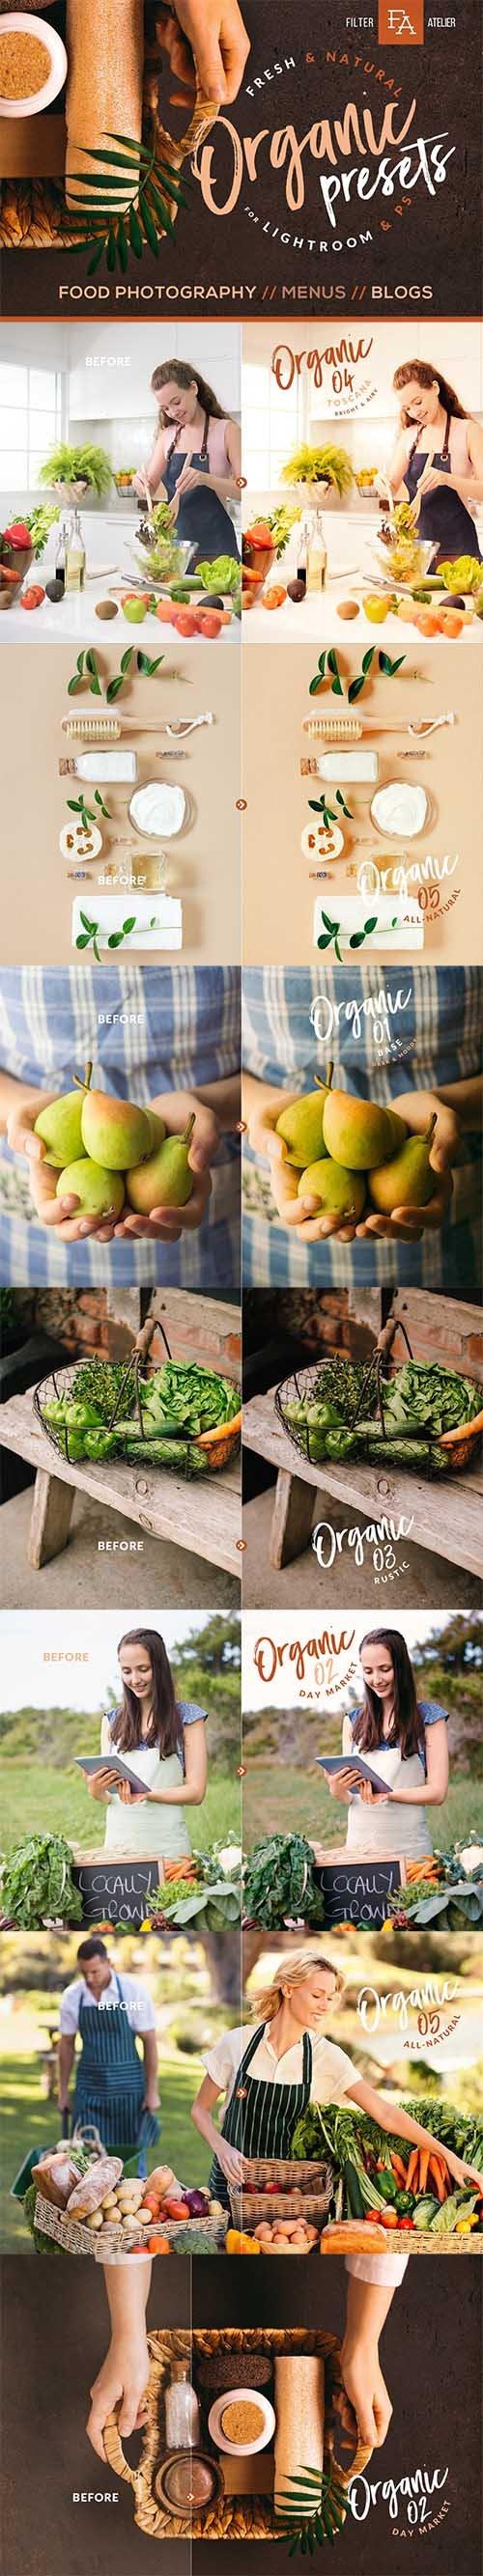 Organic Food Presets for Desktop & Mobile